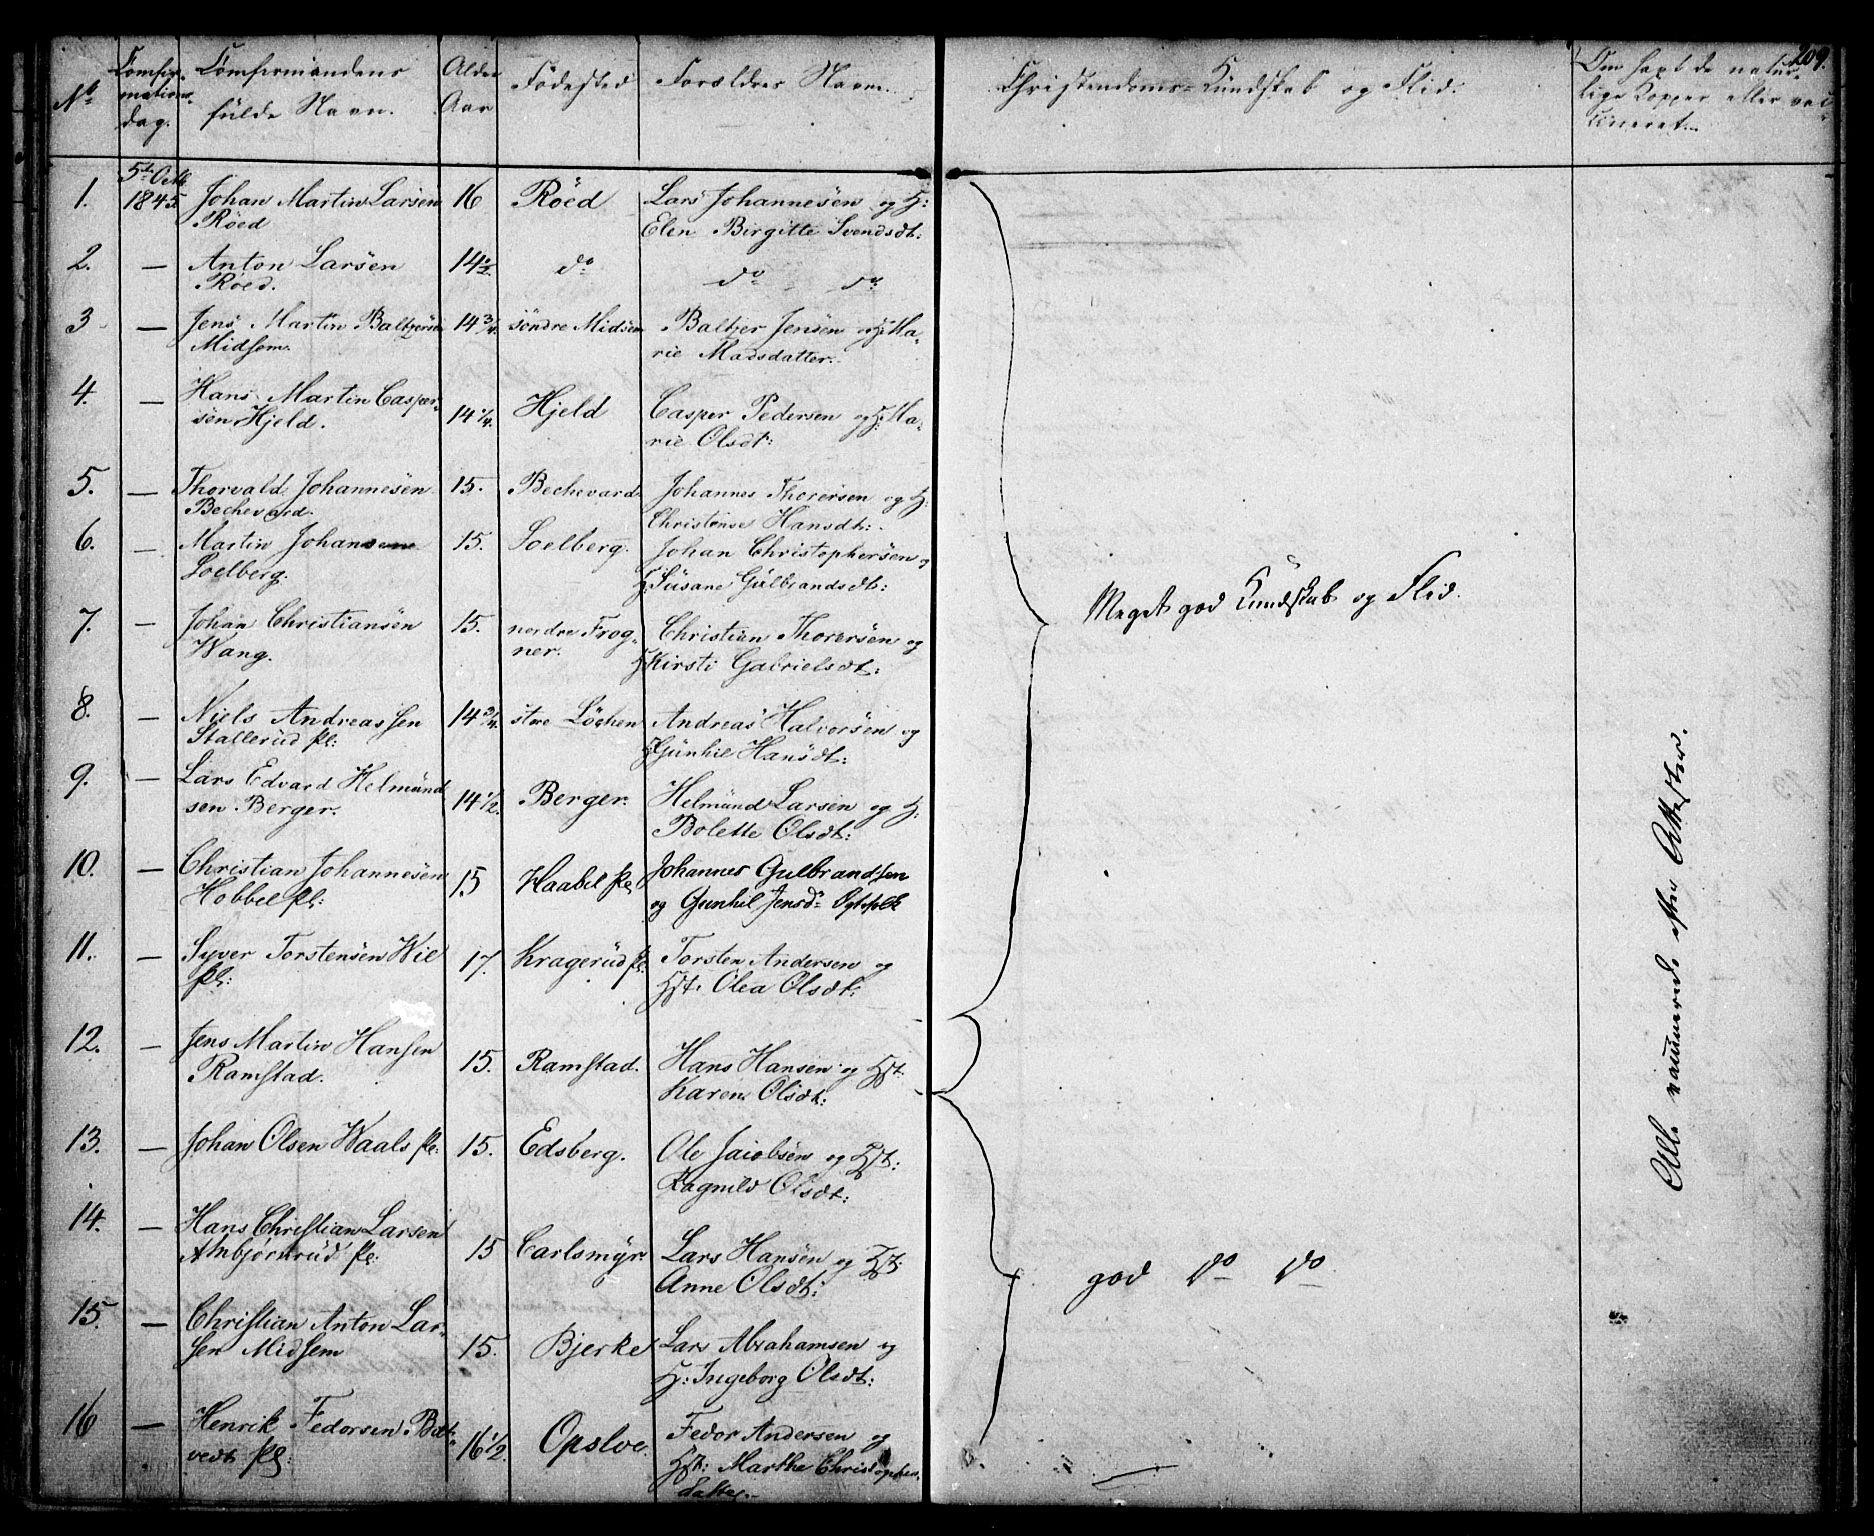 SAO, Kråkstad prestekontor Kirkebøker, F/Fa/L0005: Parish register (official) no. I 5, 1837-1847, p. 209